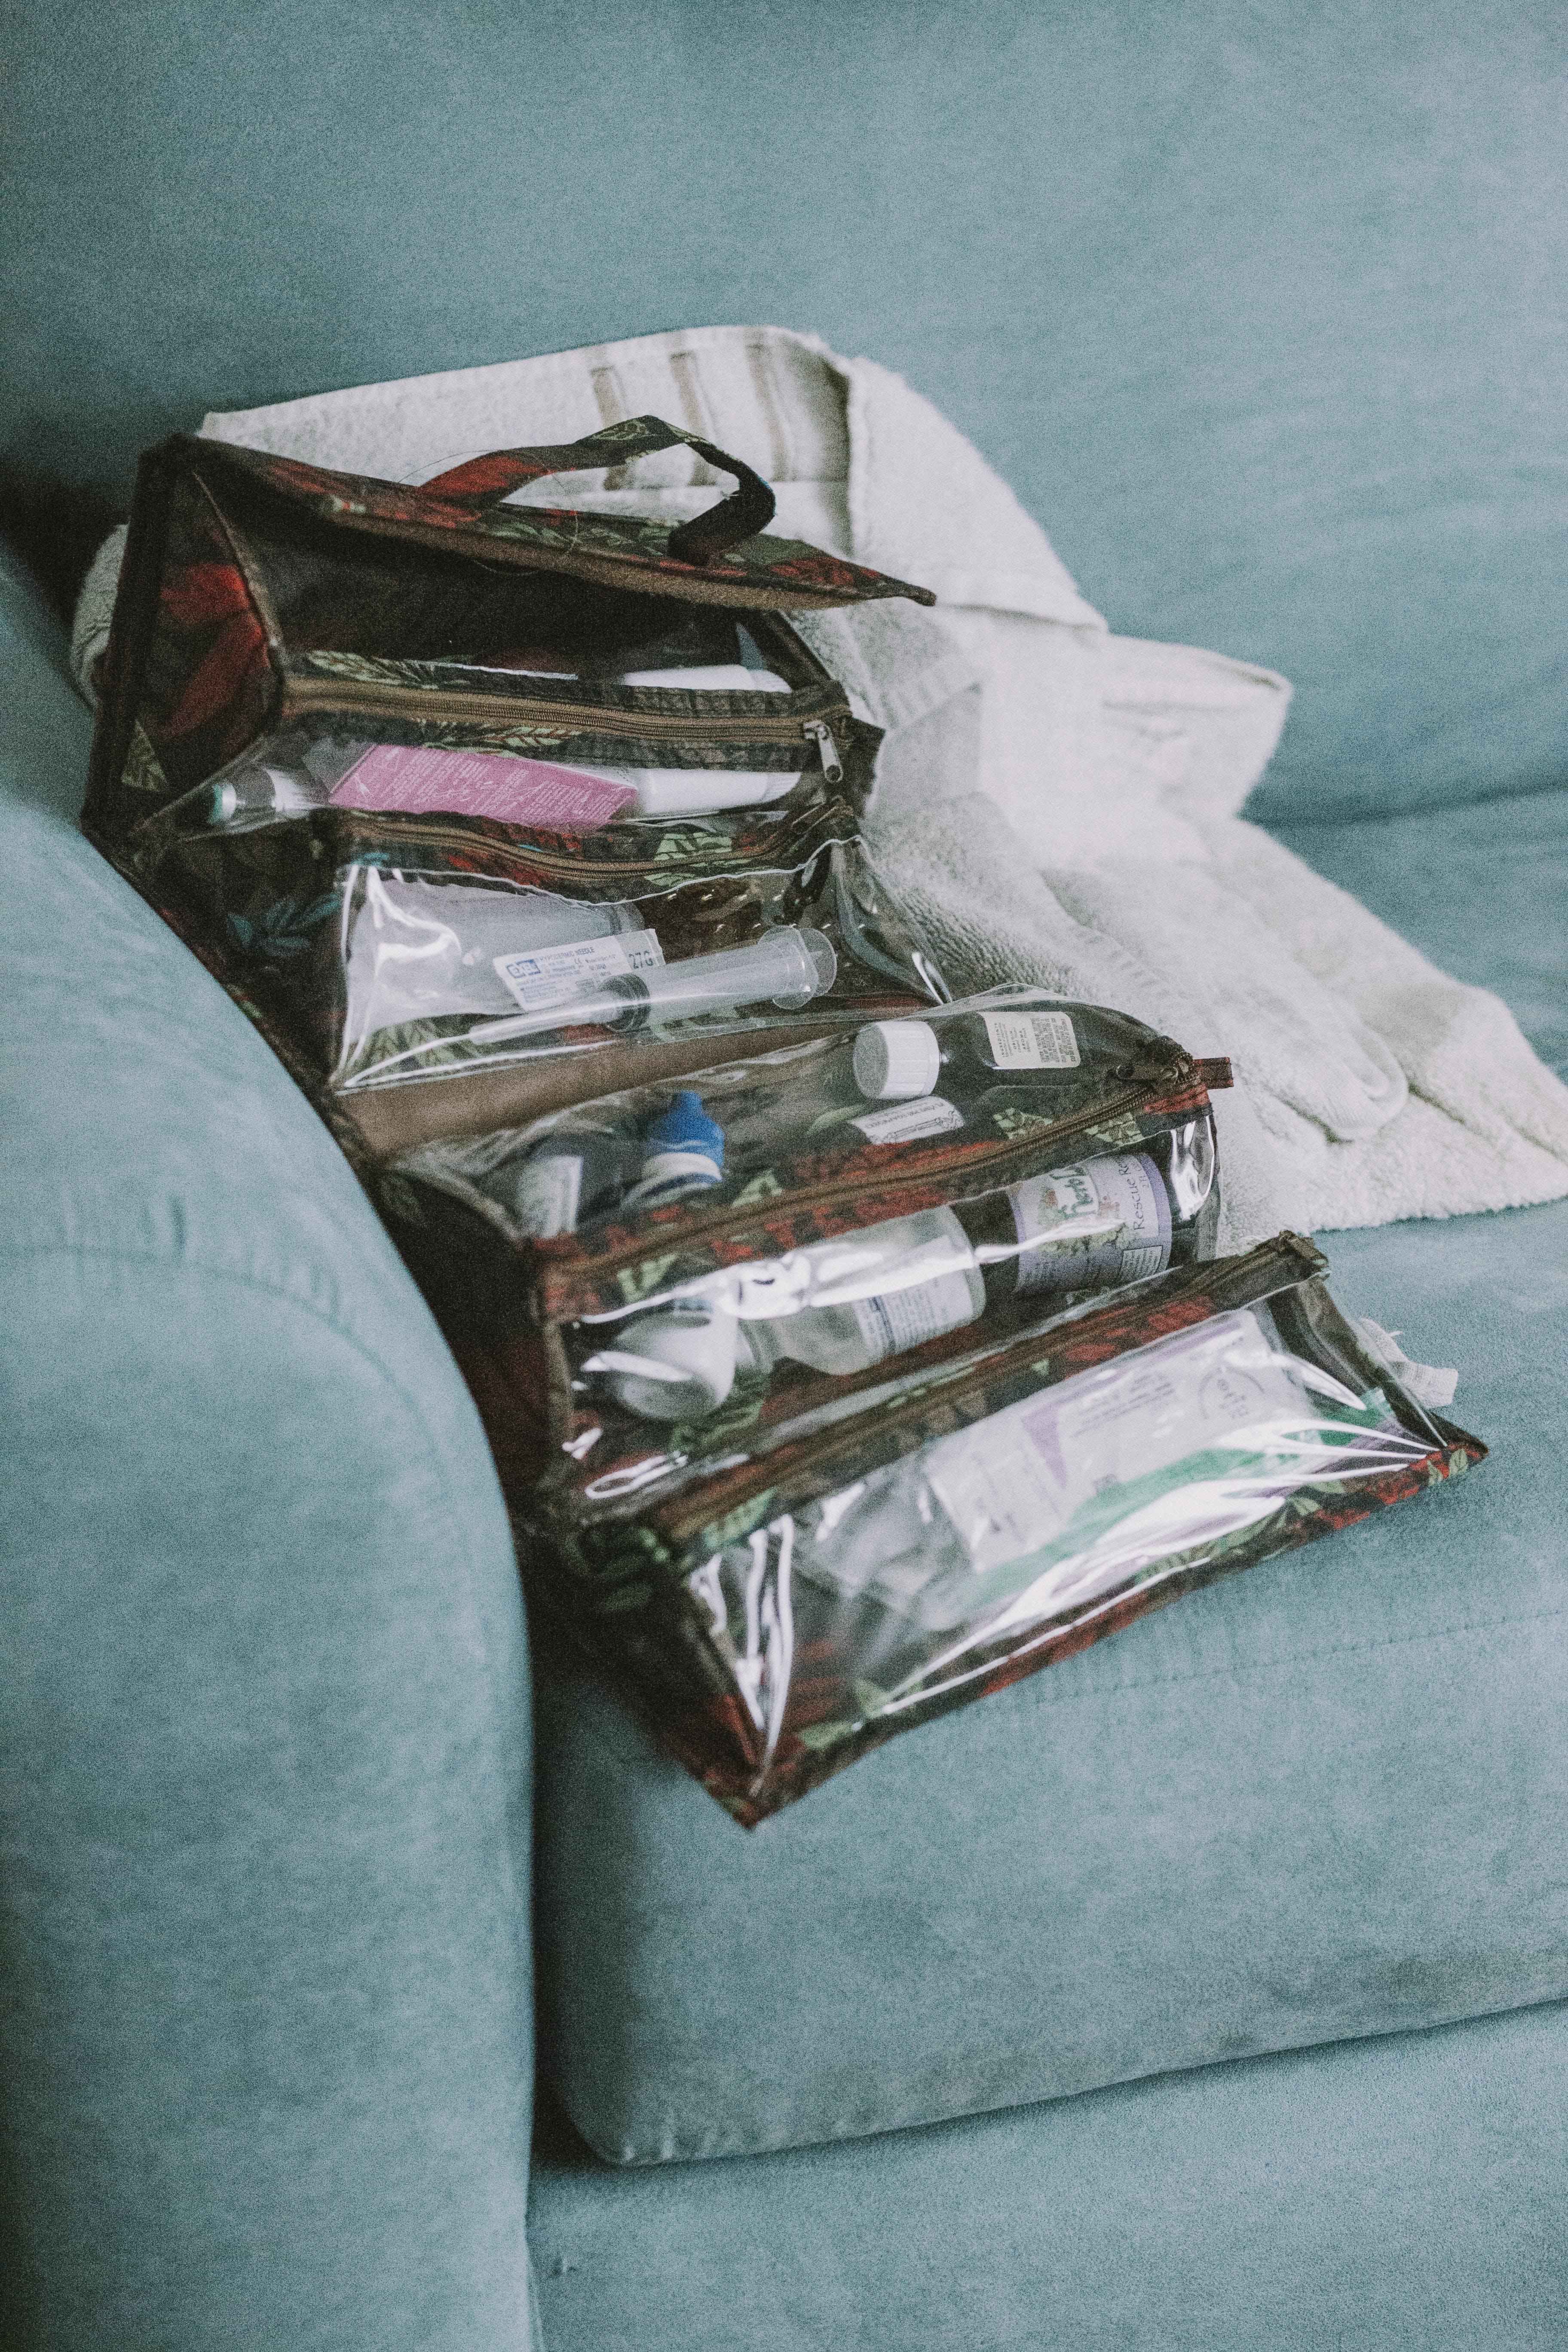 Items Inside Brown Hanging Organizer on Green Sofa